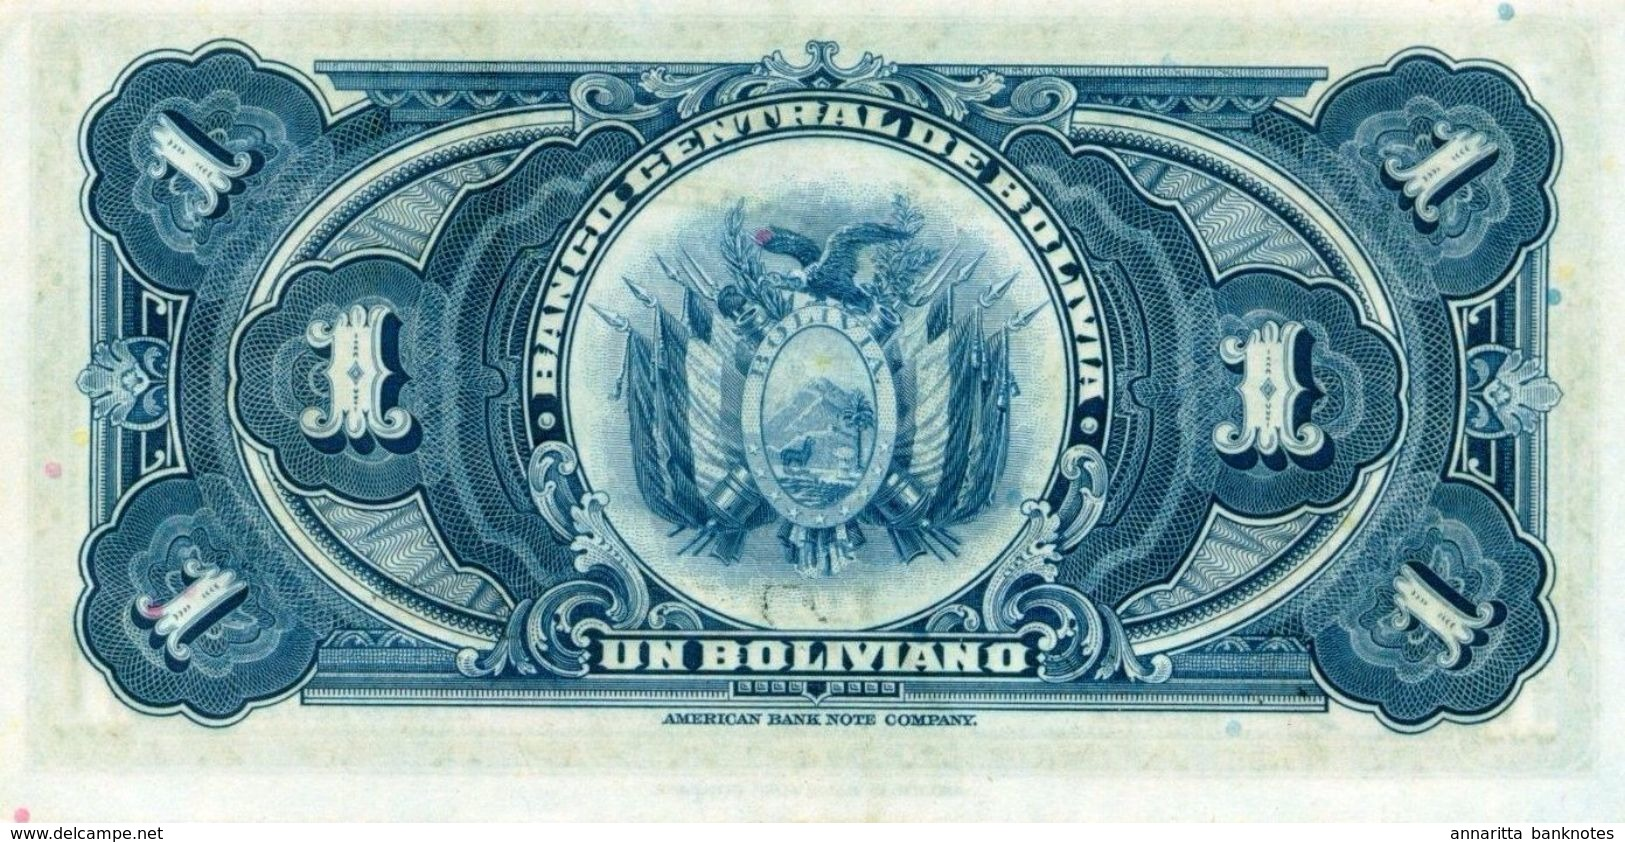 BOLIVIA 1 BOLIVIANO 1928 P-118a XF SERIES S5 [BO118a] - Bolivia